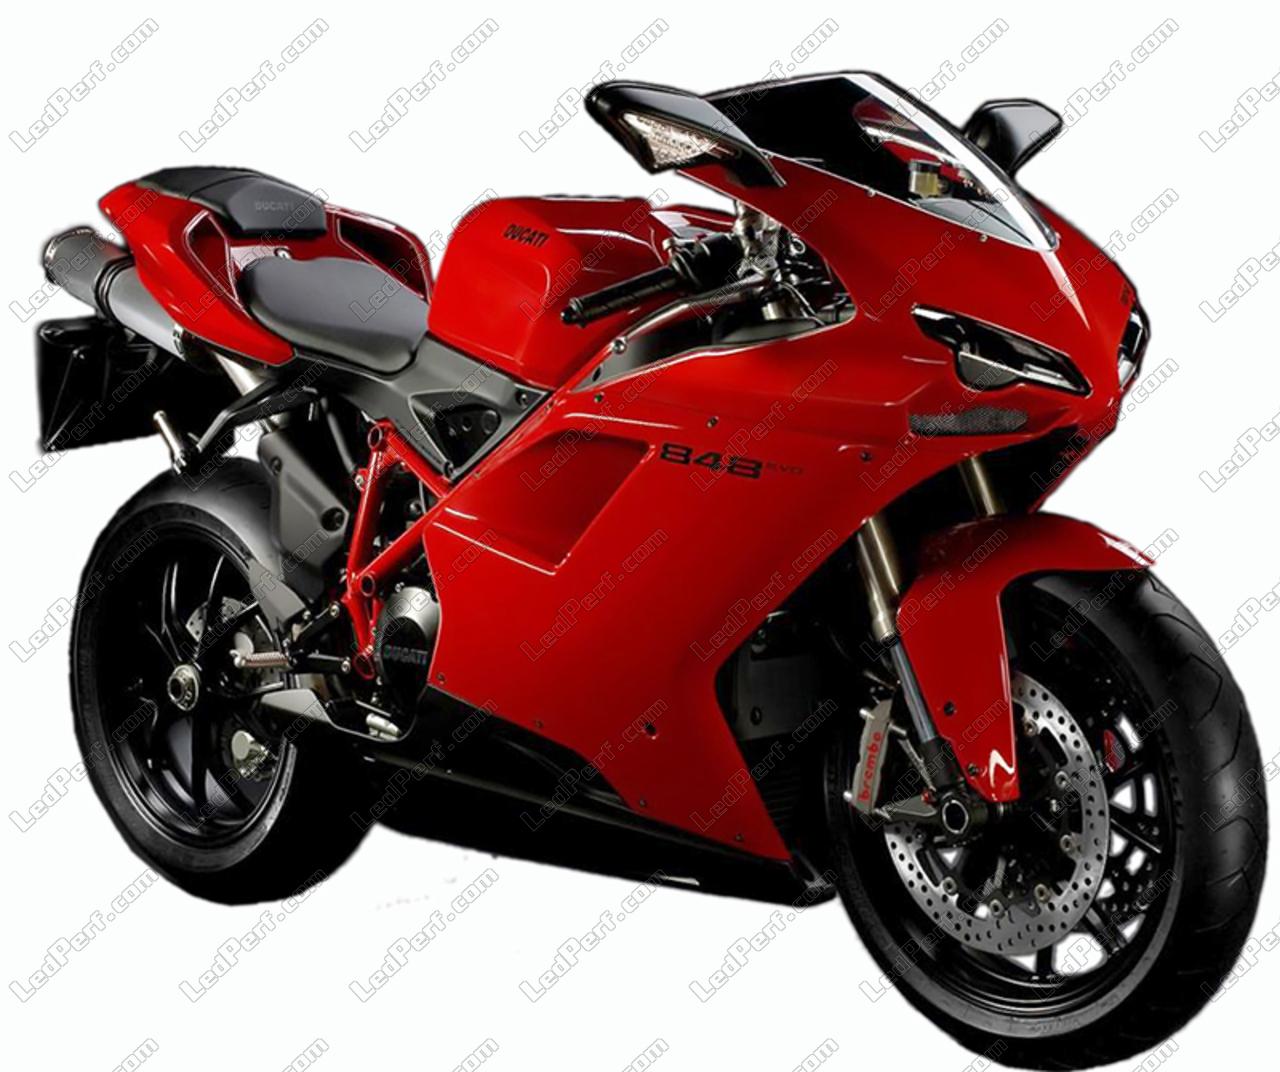 Packs Par Marque Moto Scooter Quad Ssv Spyder Ducati 848